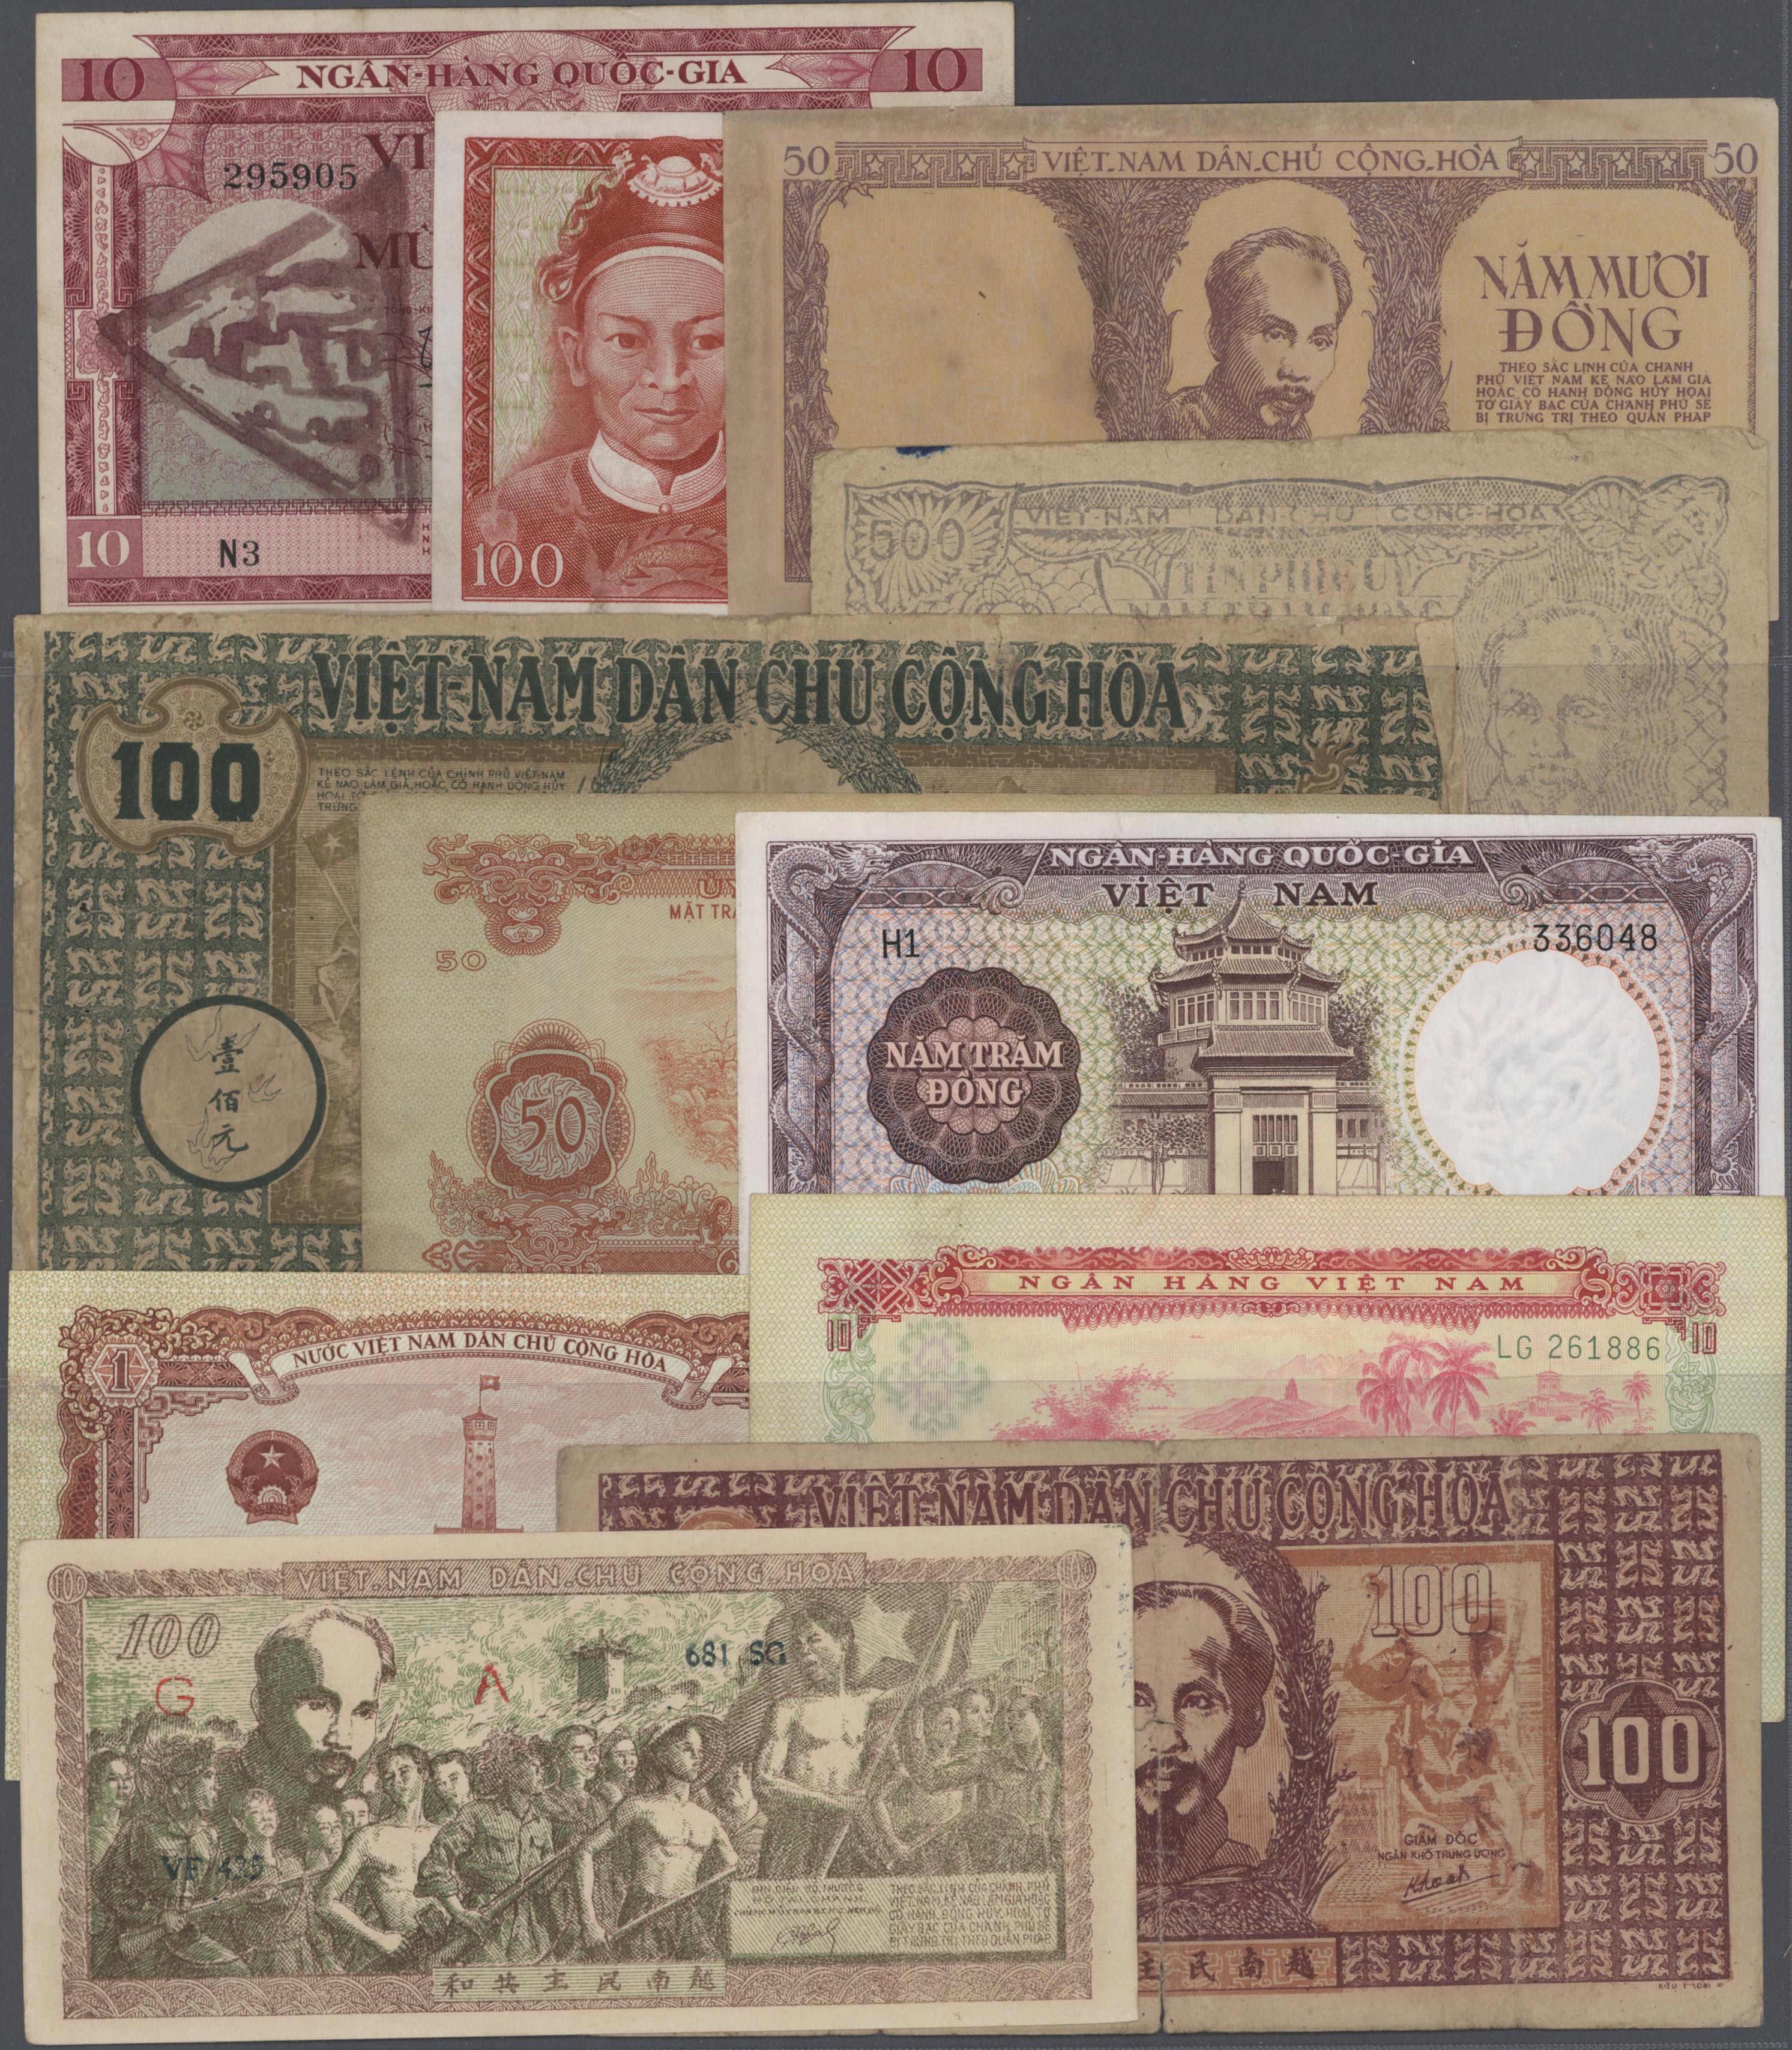 Lot 2680 - Vietnam | Banknoten  -  Auktionshaus Christoph Gärtner GmbH & Co. KG Banknotes & Coins Auction #39 Day 2